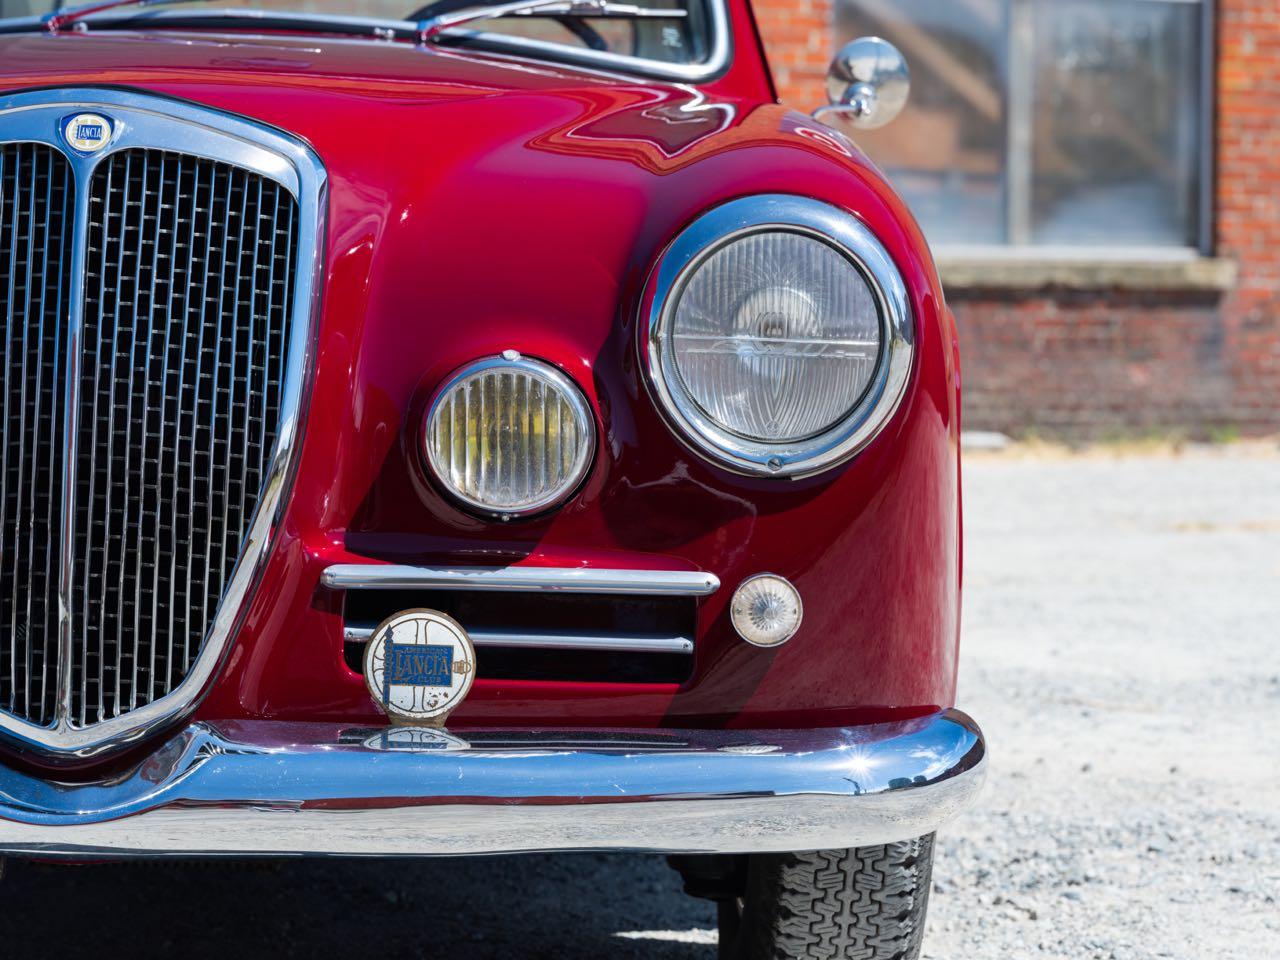 '55 Lancia Aurelia B20 GT - Ca, c'était avant ! 1